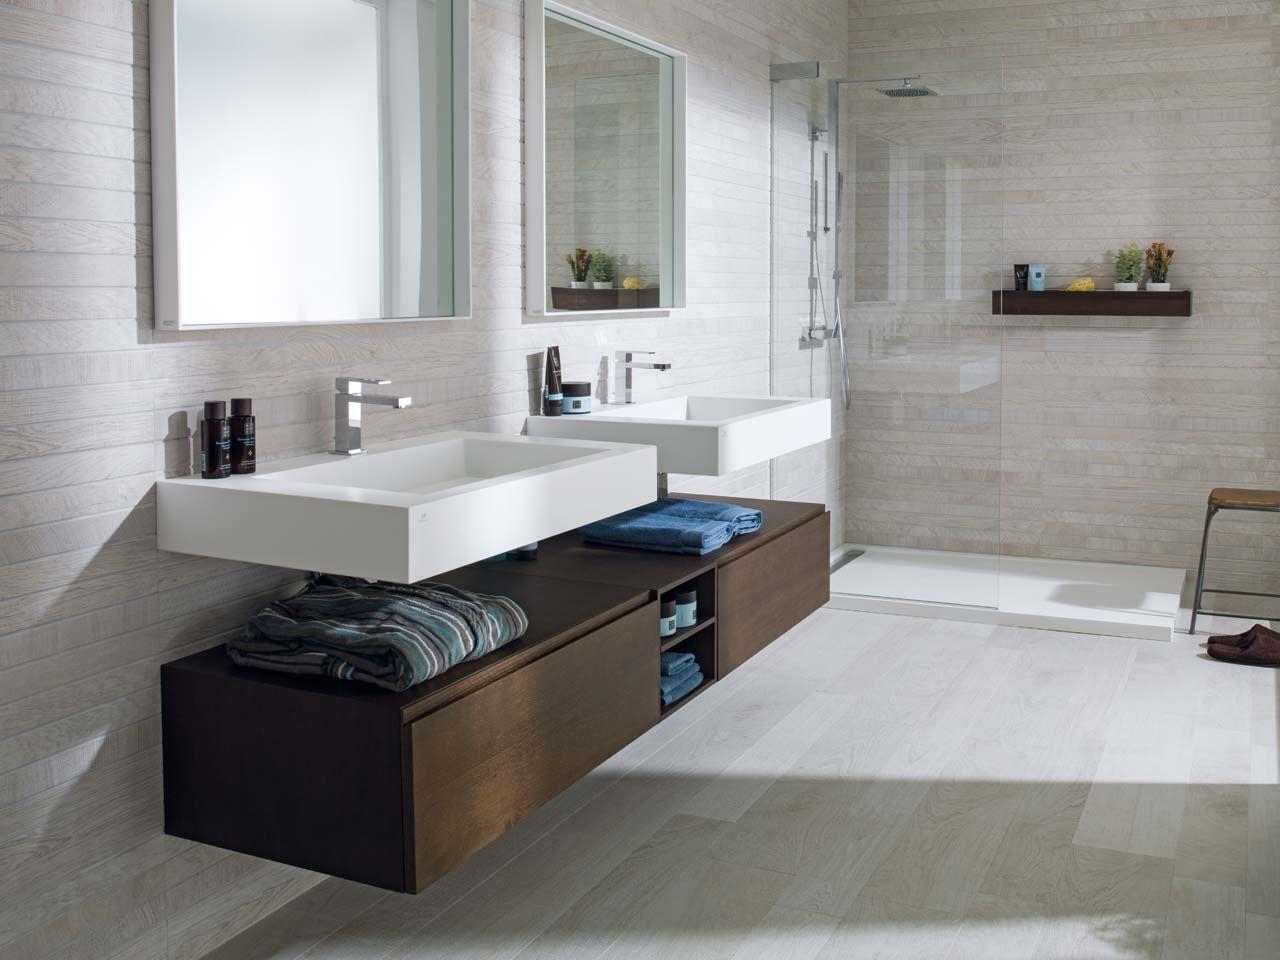 Krion collections de salles de bains ras maison - Banos actuales ...